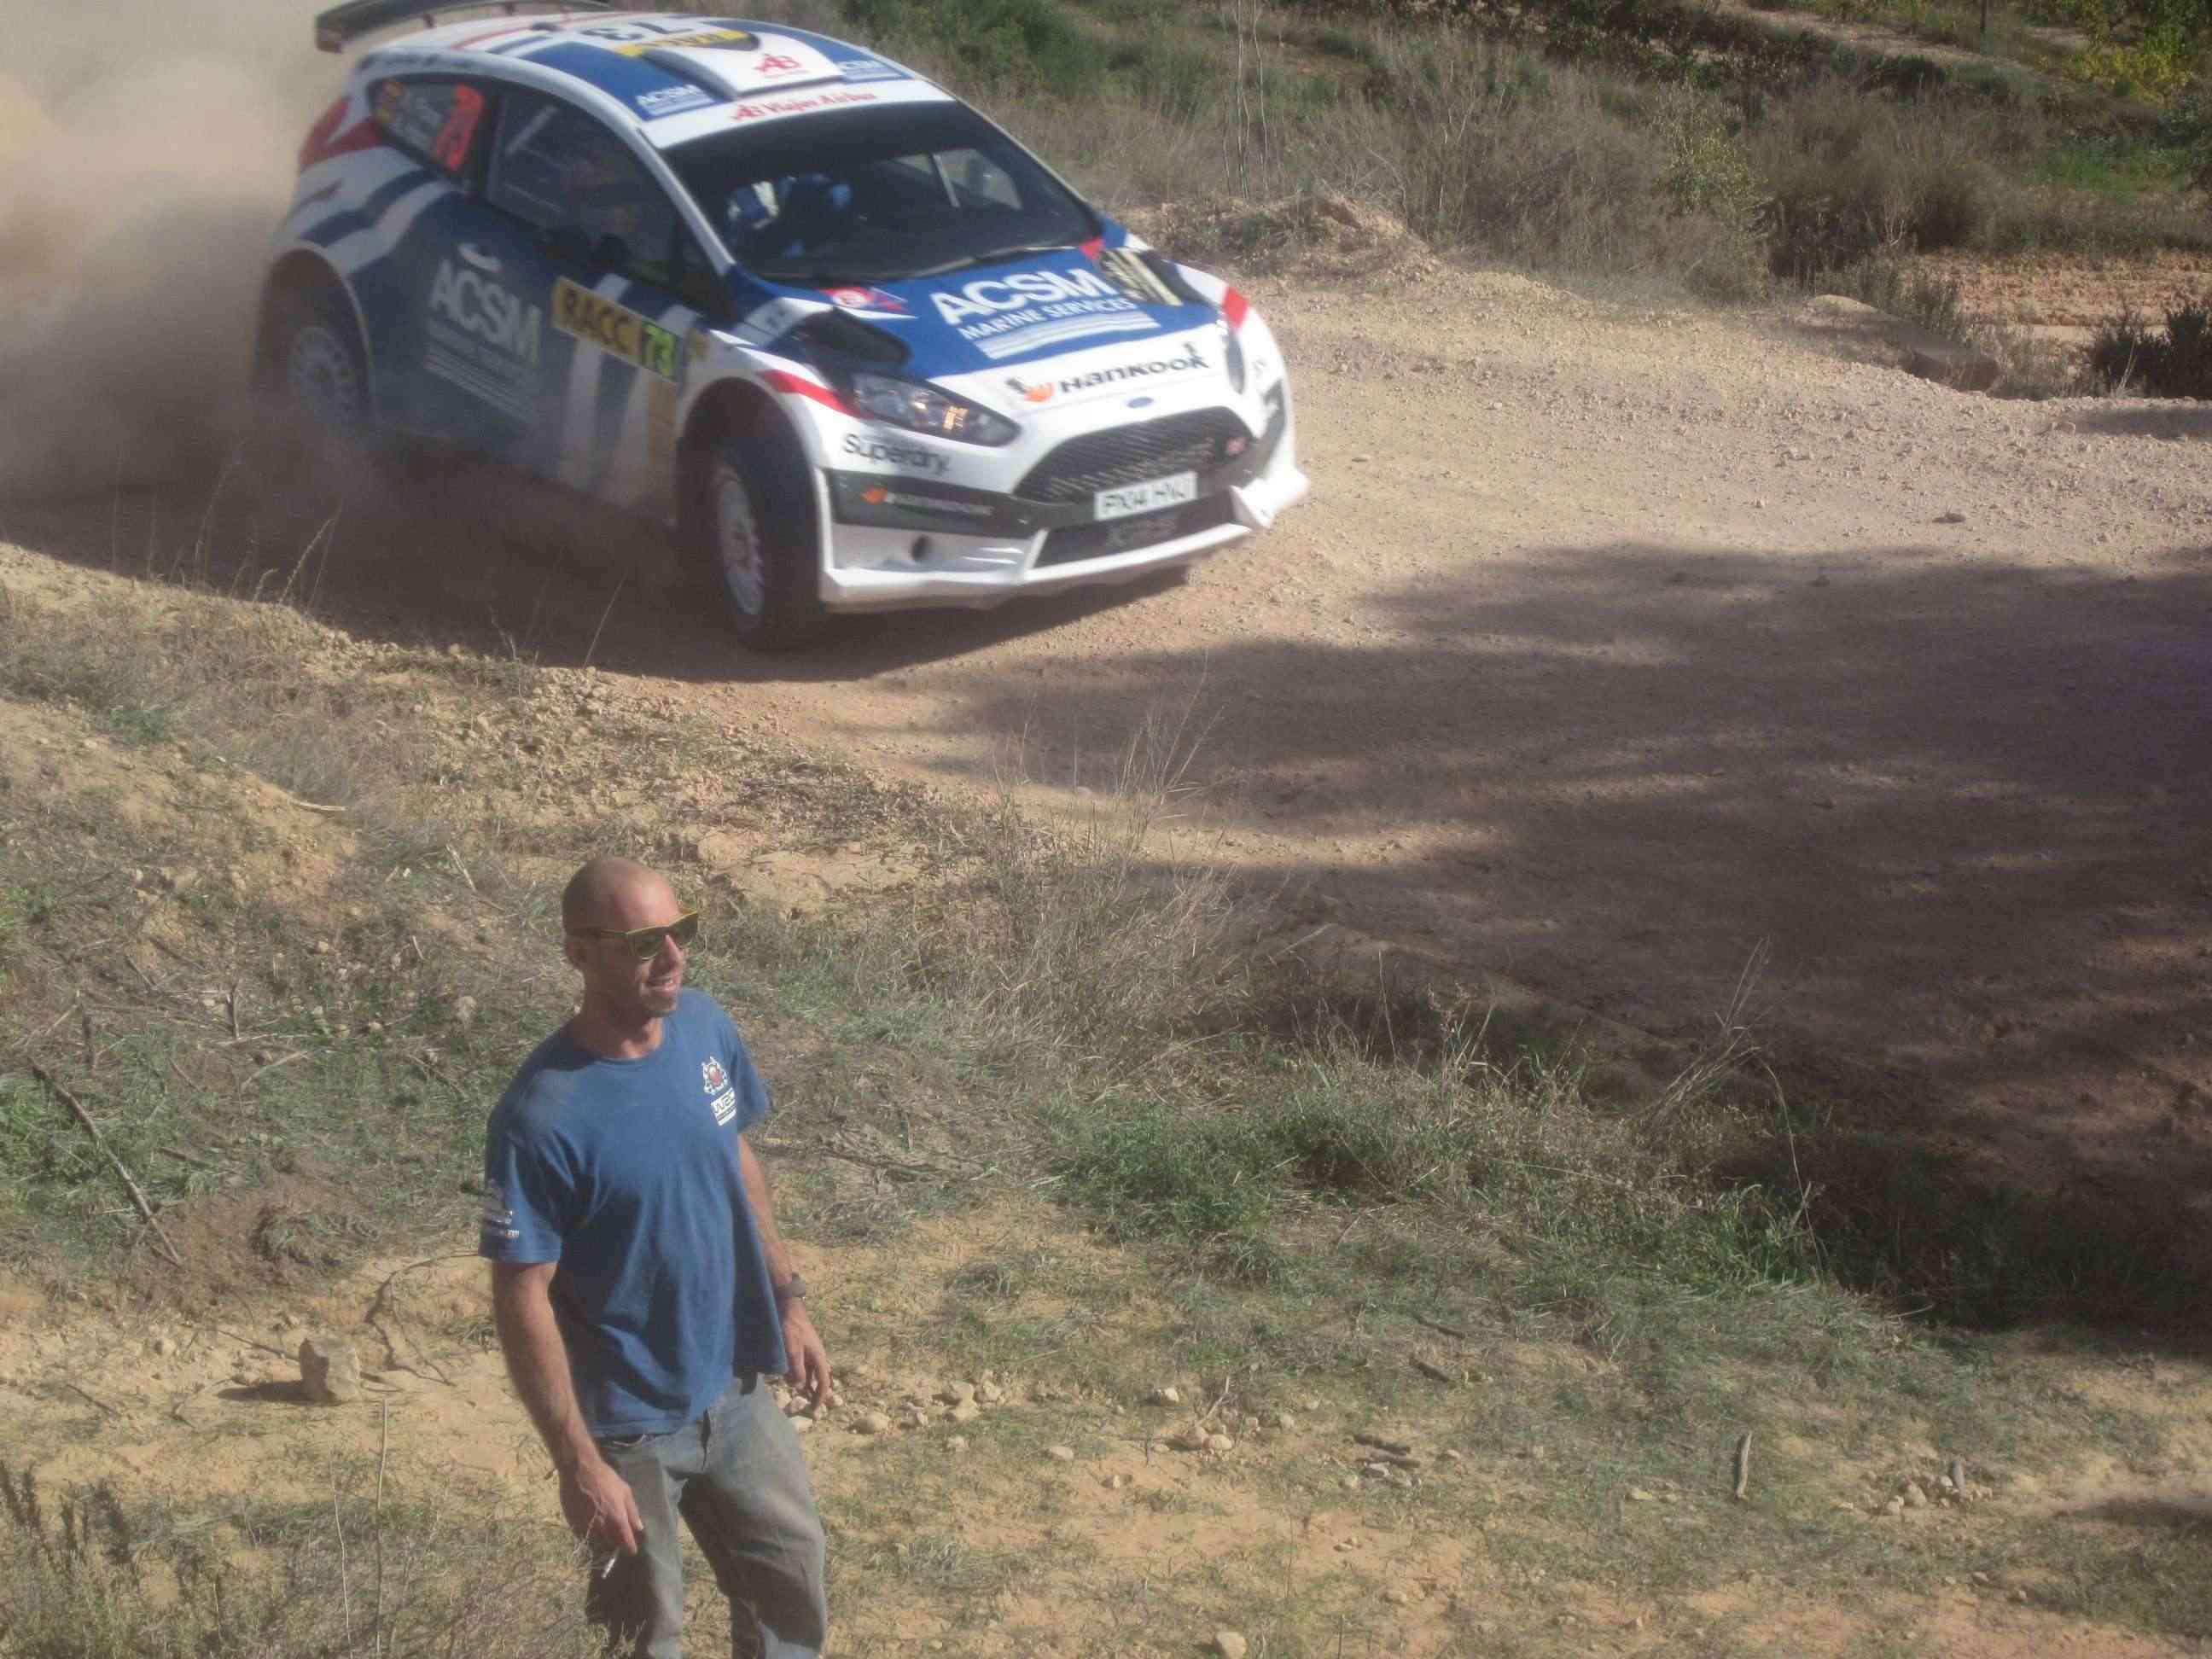 Quedada RaulGuerrero91 y Ruvigas   Rally España  Catalunya-Costa Daurada 2014 Img_8810